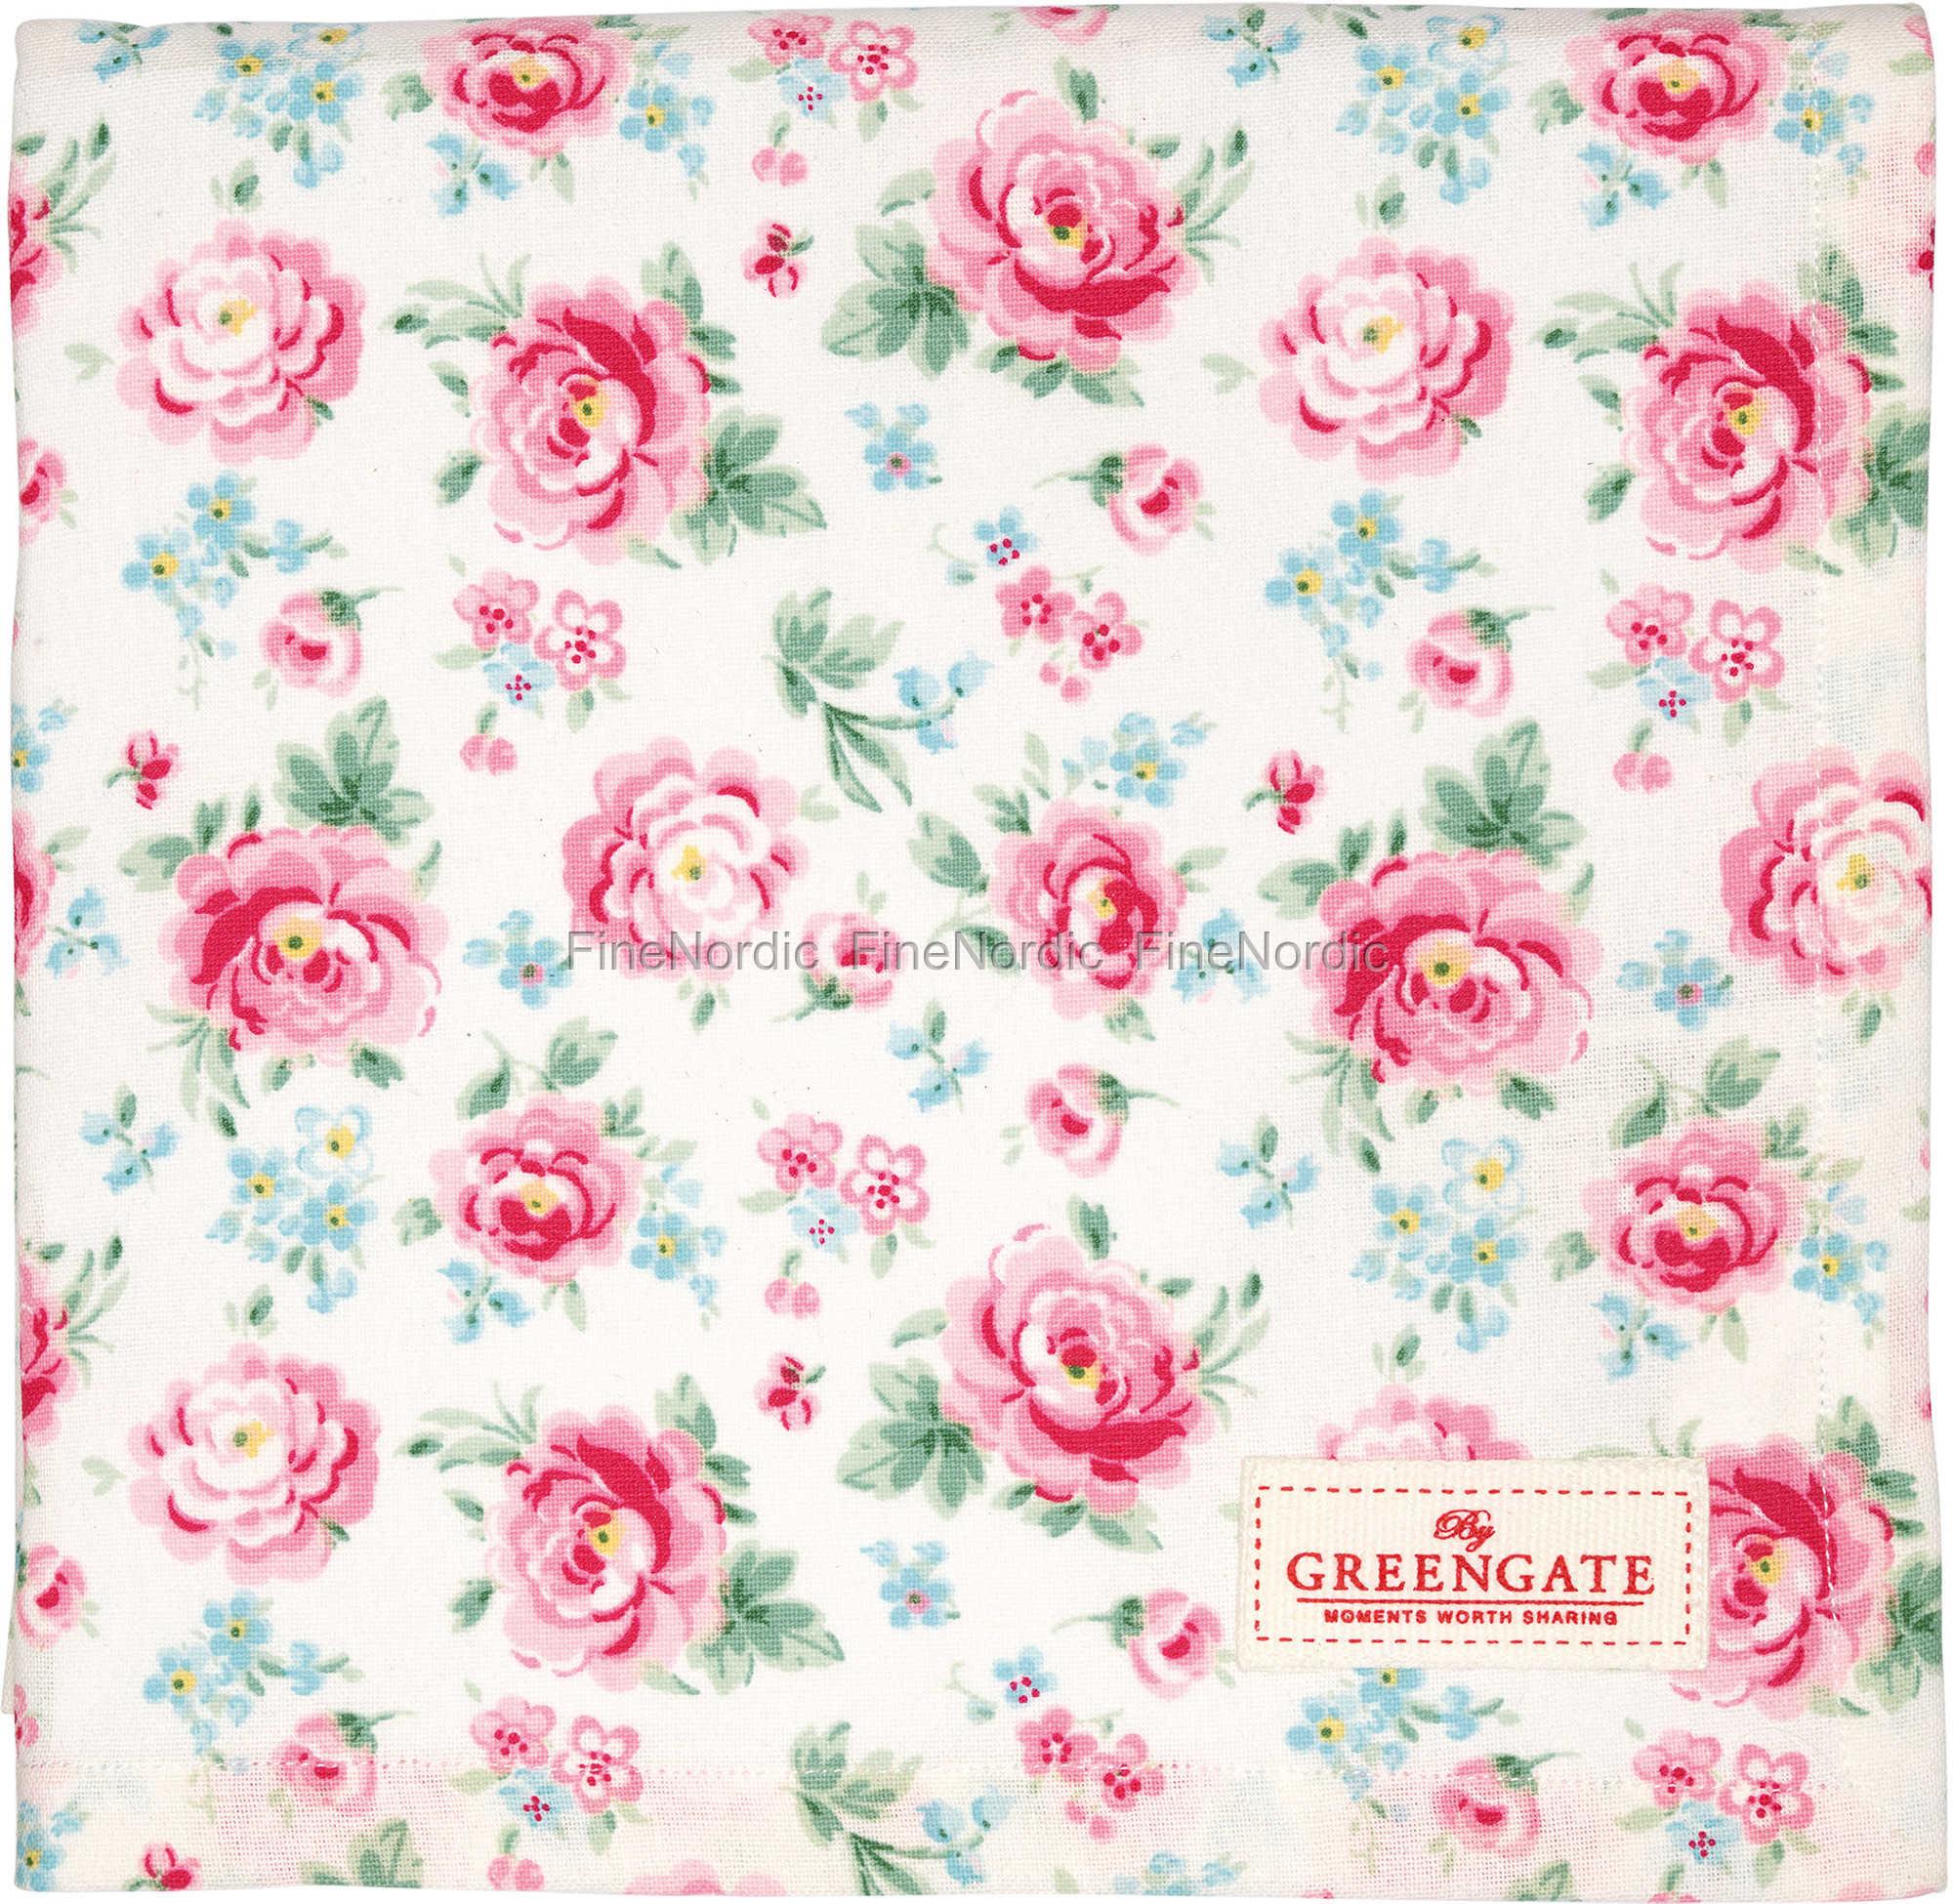 greengate tischdecke tablecloth meryl white 150 x 150 cm. Black Bedroom Furniture Sets. Home Design Ideas